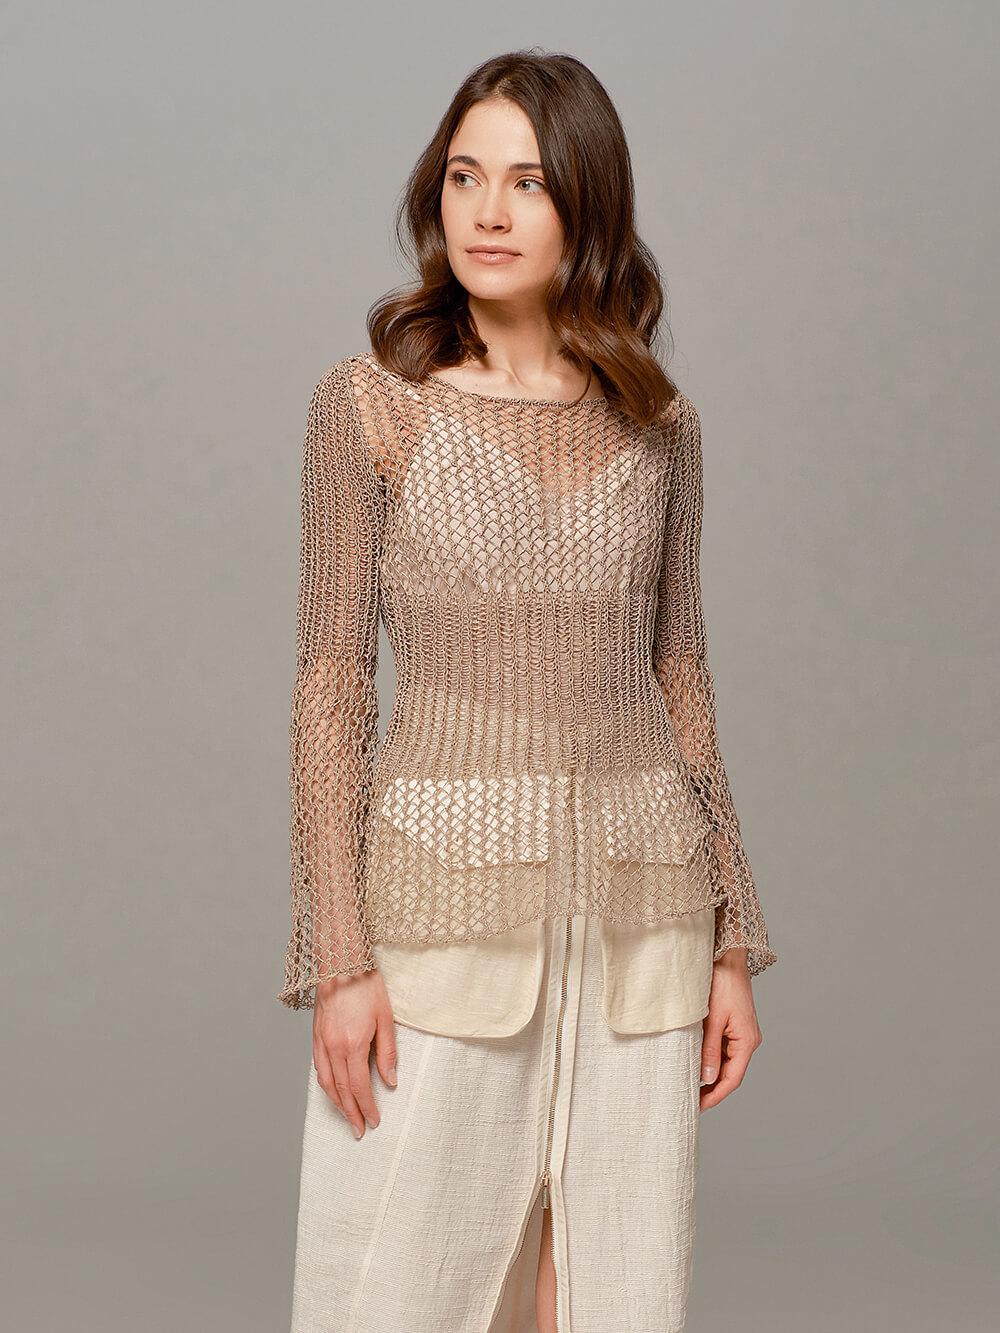 Женский свитер бежевого цвета Olmar GentryPortofino - фото 1